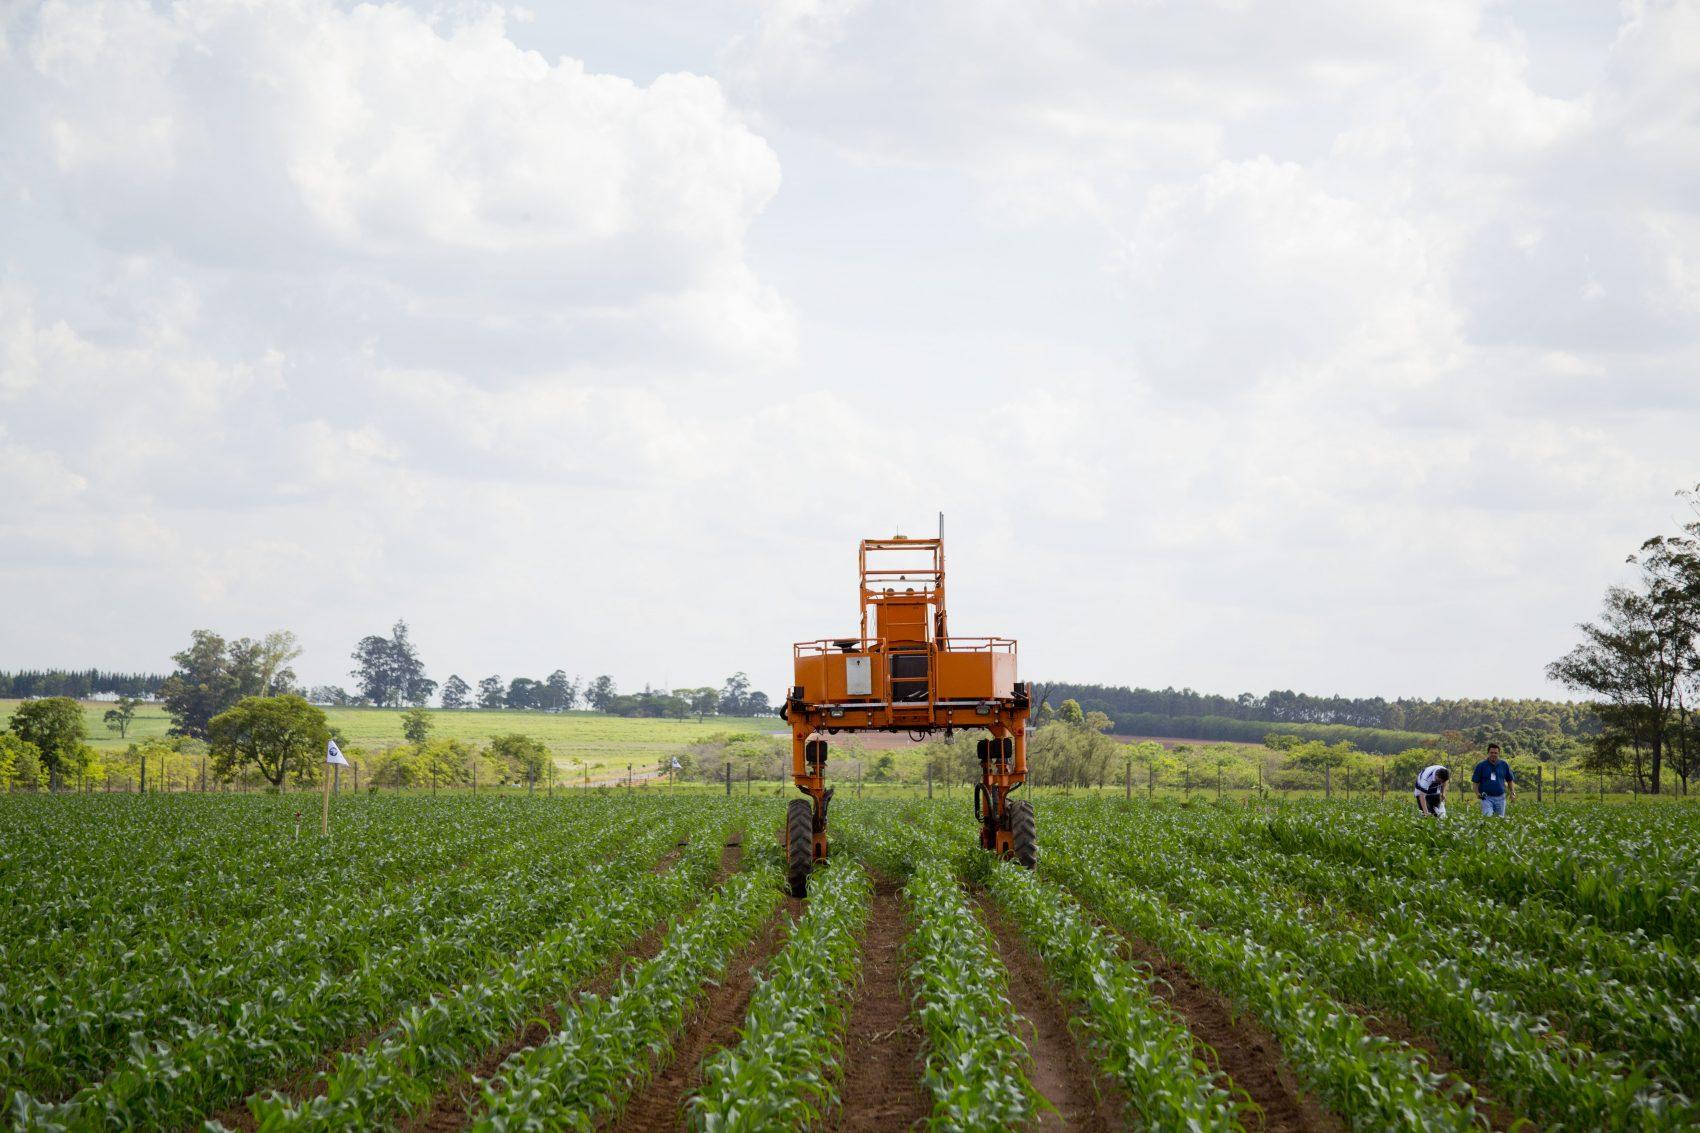 A tecnologia é aliada da produtividade na agricultura brasileira (foto luiza stalder/Embrapa)